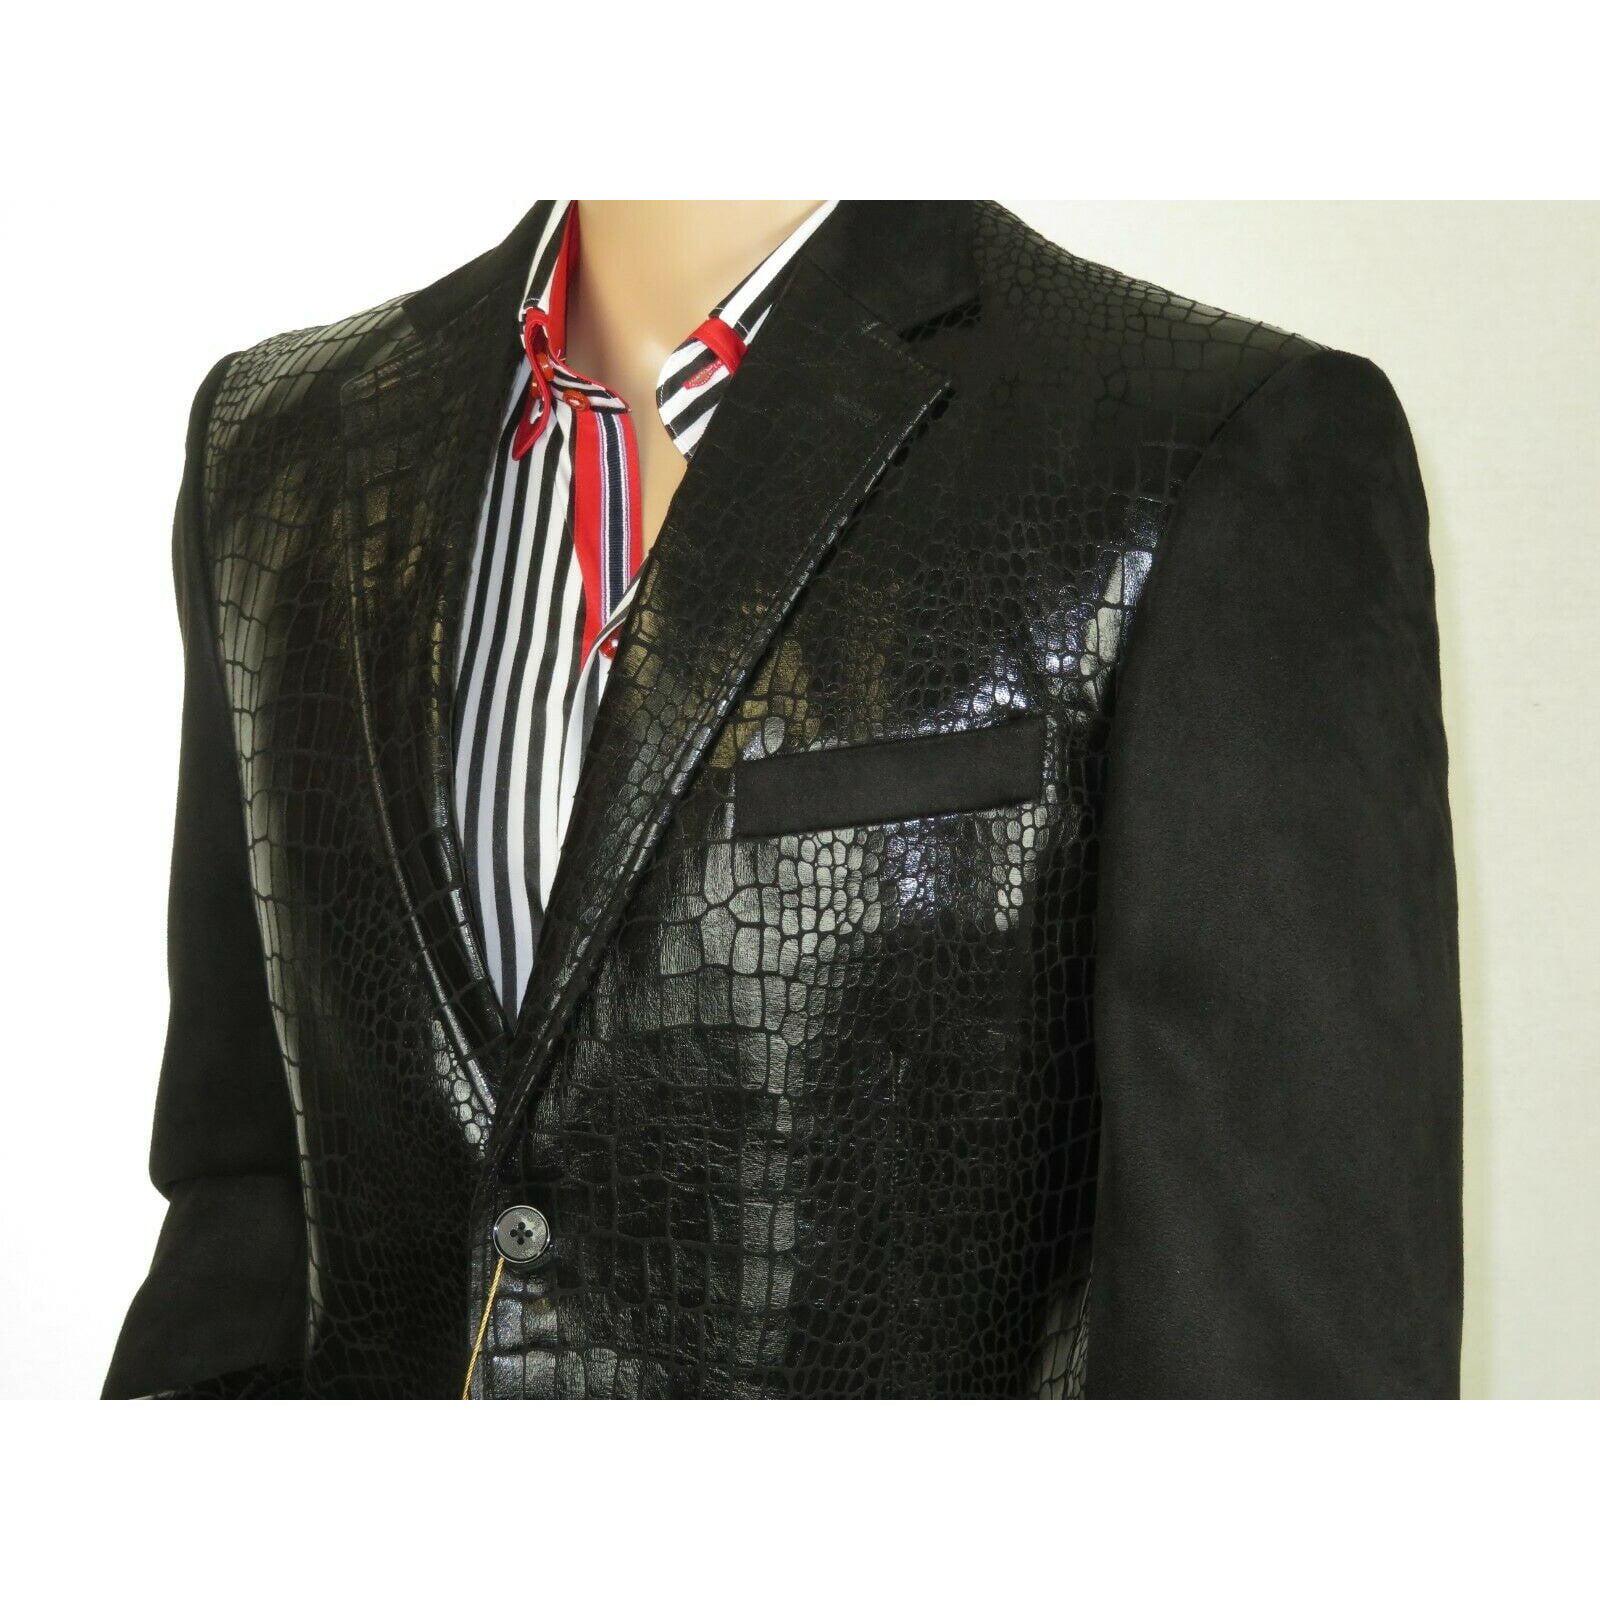 Mens Sports Coat INSERCH Micro Suede Crocodile print Faux Leather 565 Black New